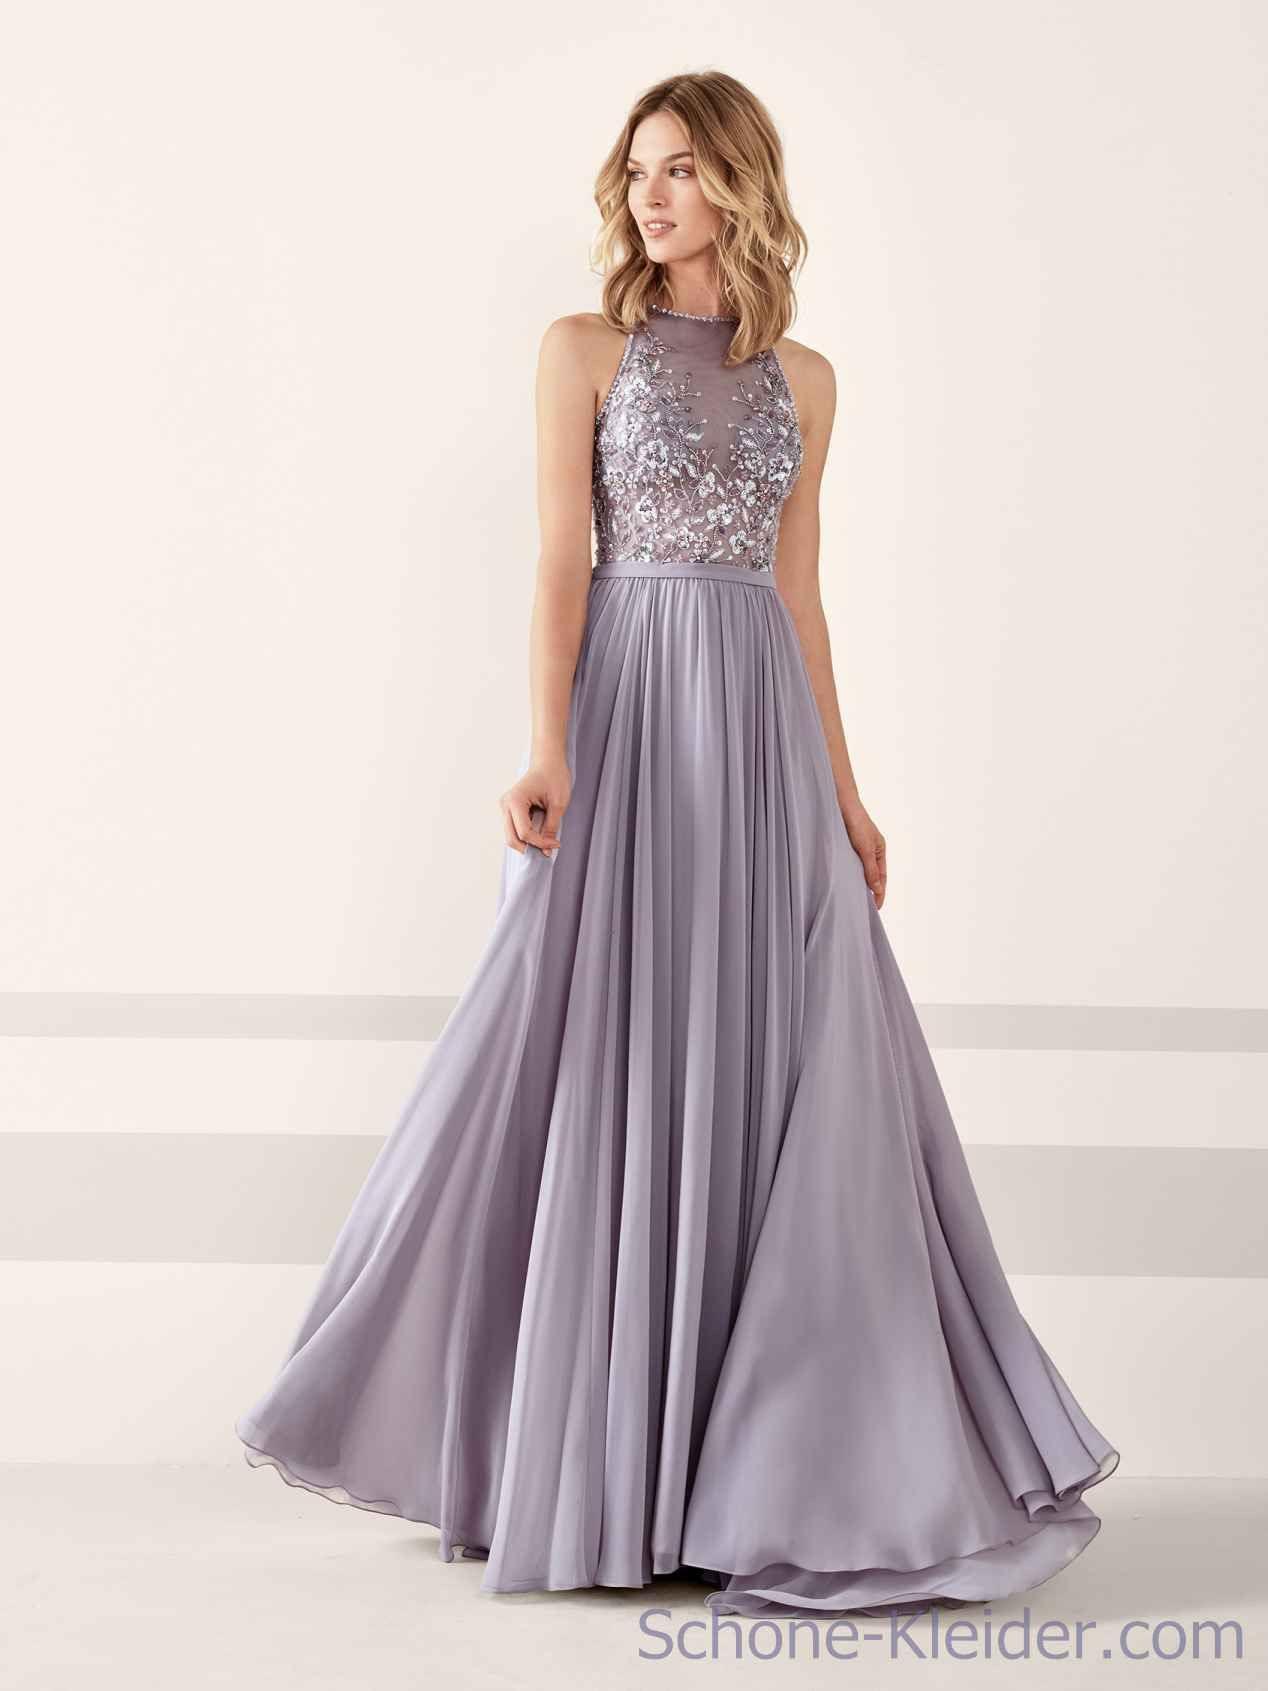 15 Coolste Pronovias Abendkleid Bester Preis20 Genial Pronovias Abendkleid für 2019